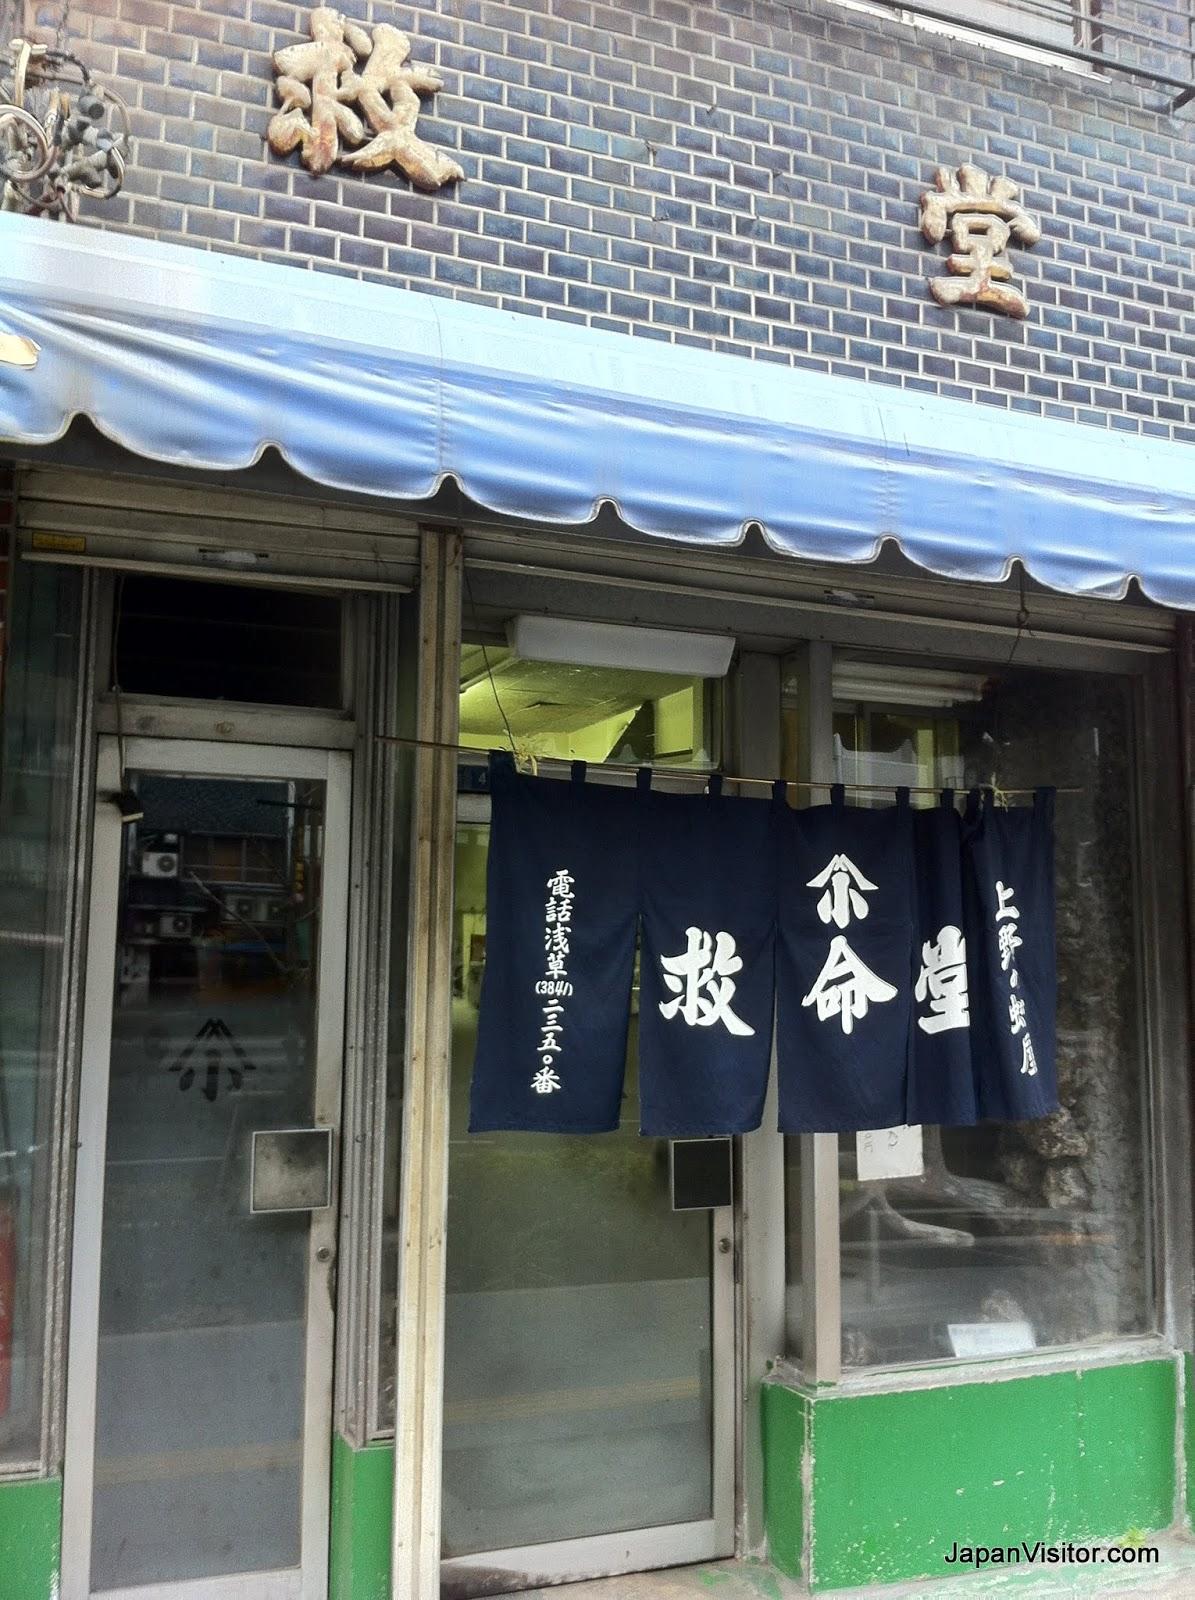 Leech shop in Ueno, Tokyo.